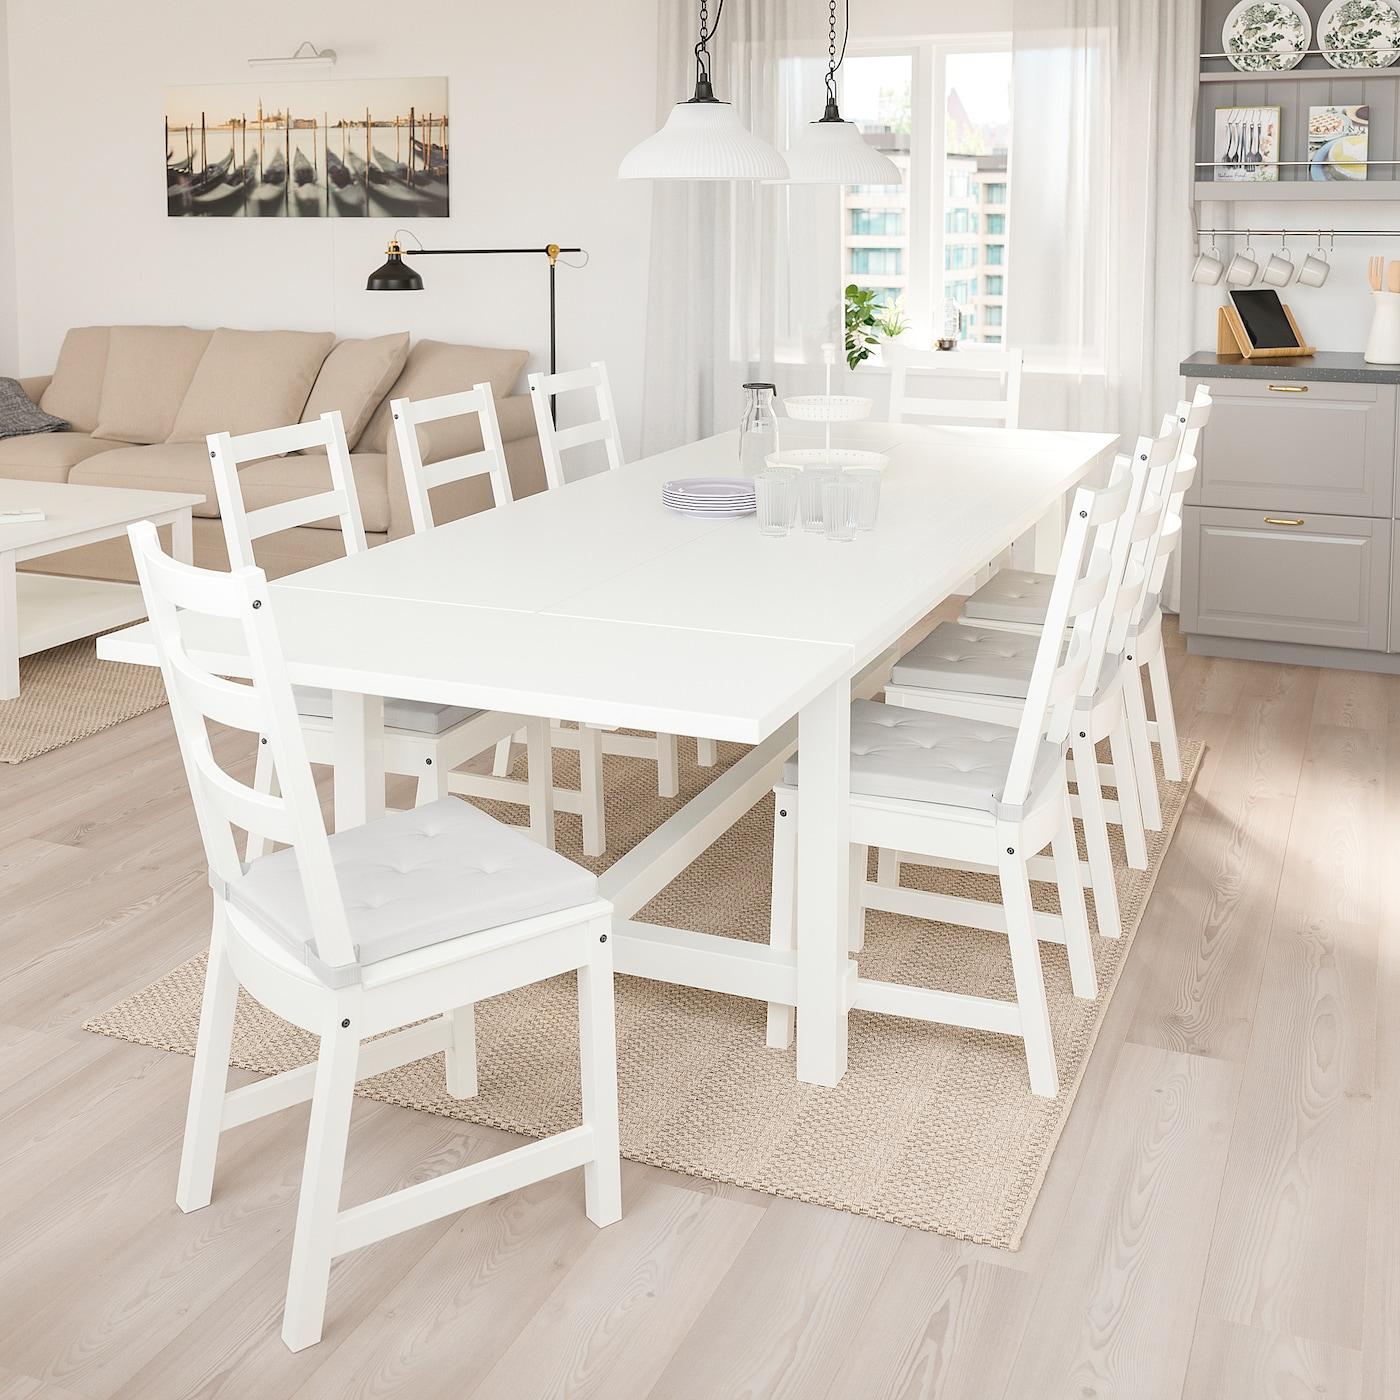 Vendita Tavoli E Sedie Firenze.Nordviken Nordviken Tavolo E 6 Sedie Bianco Bianco Ikea